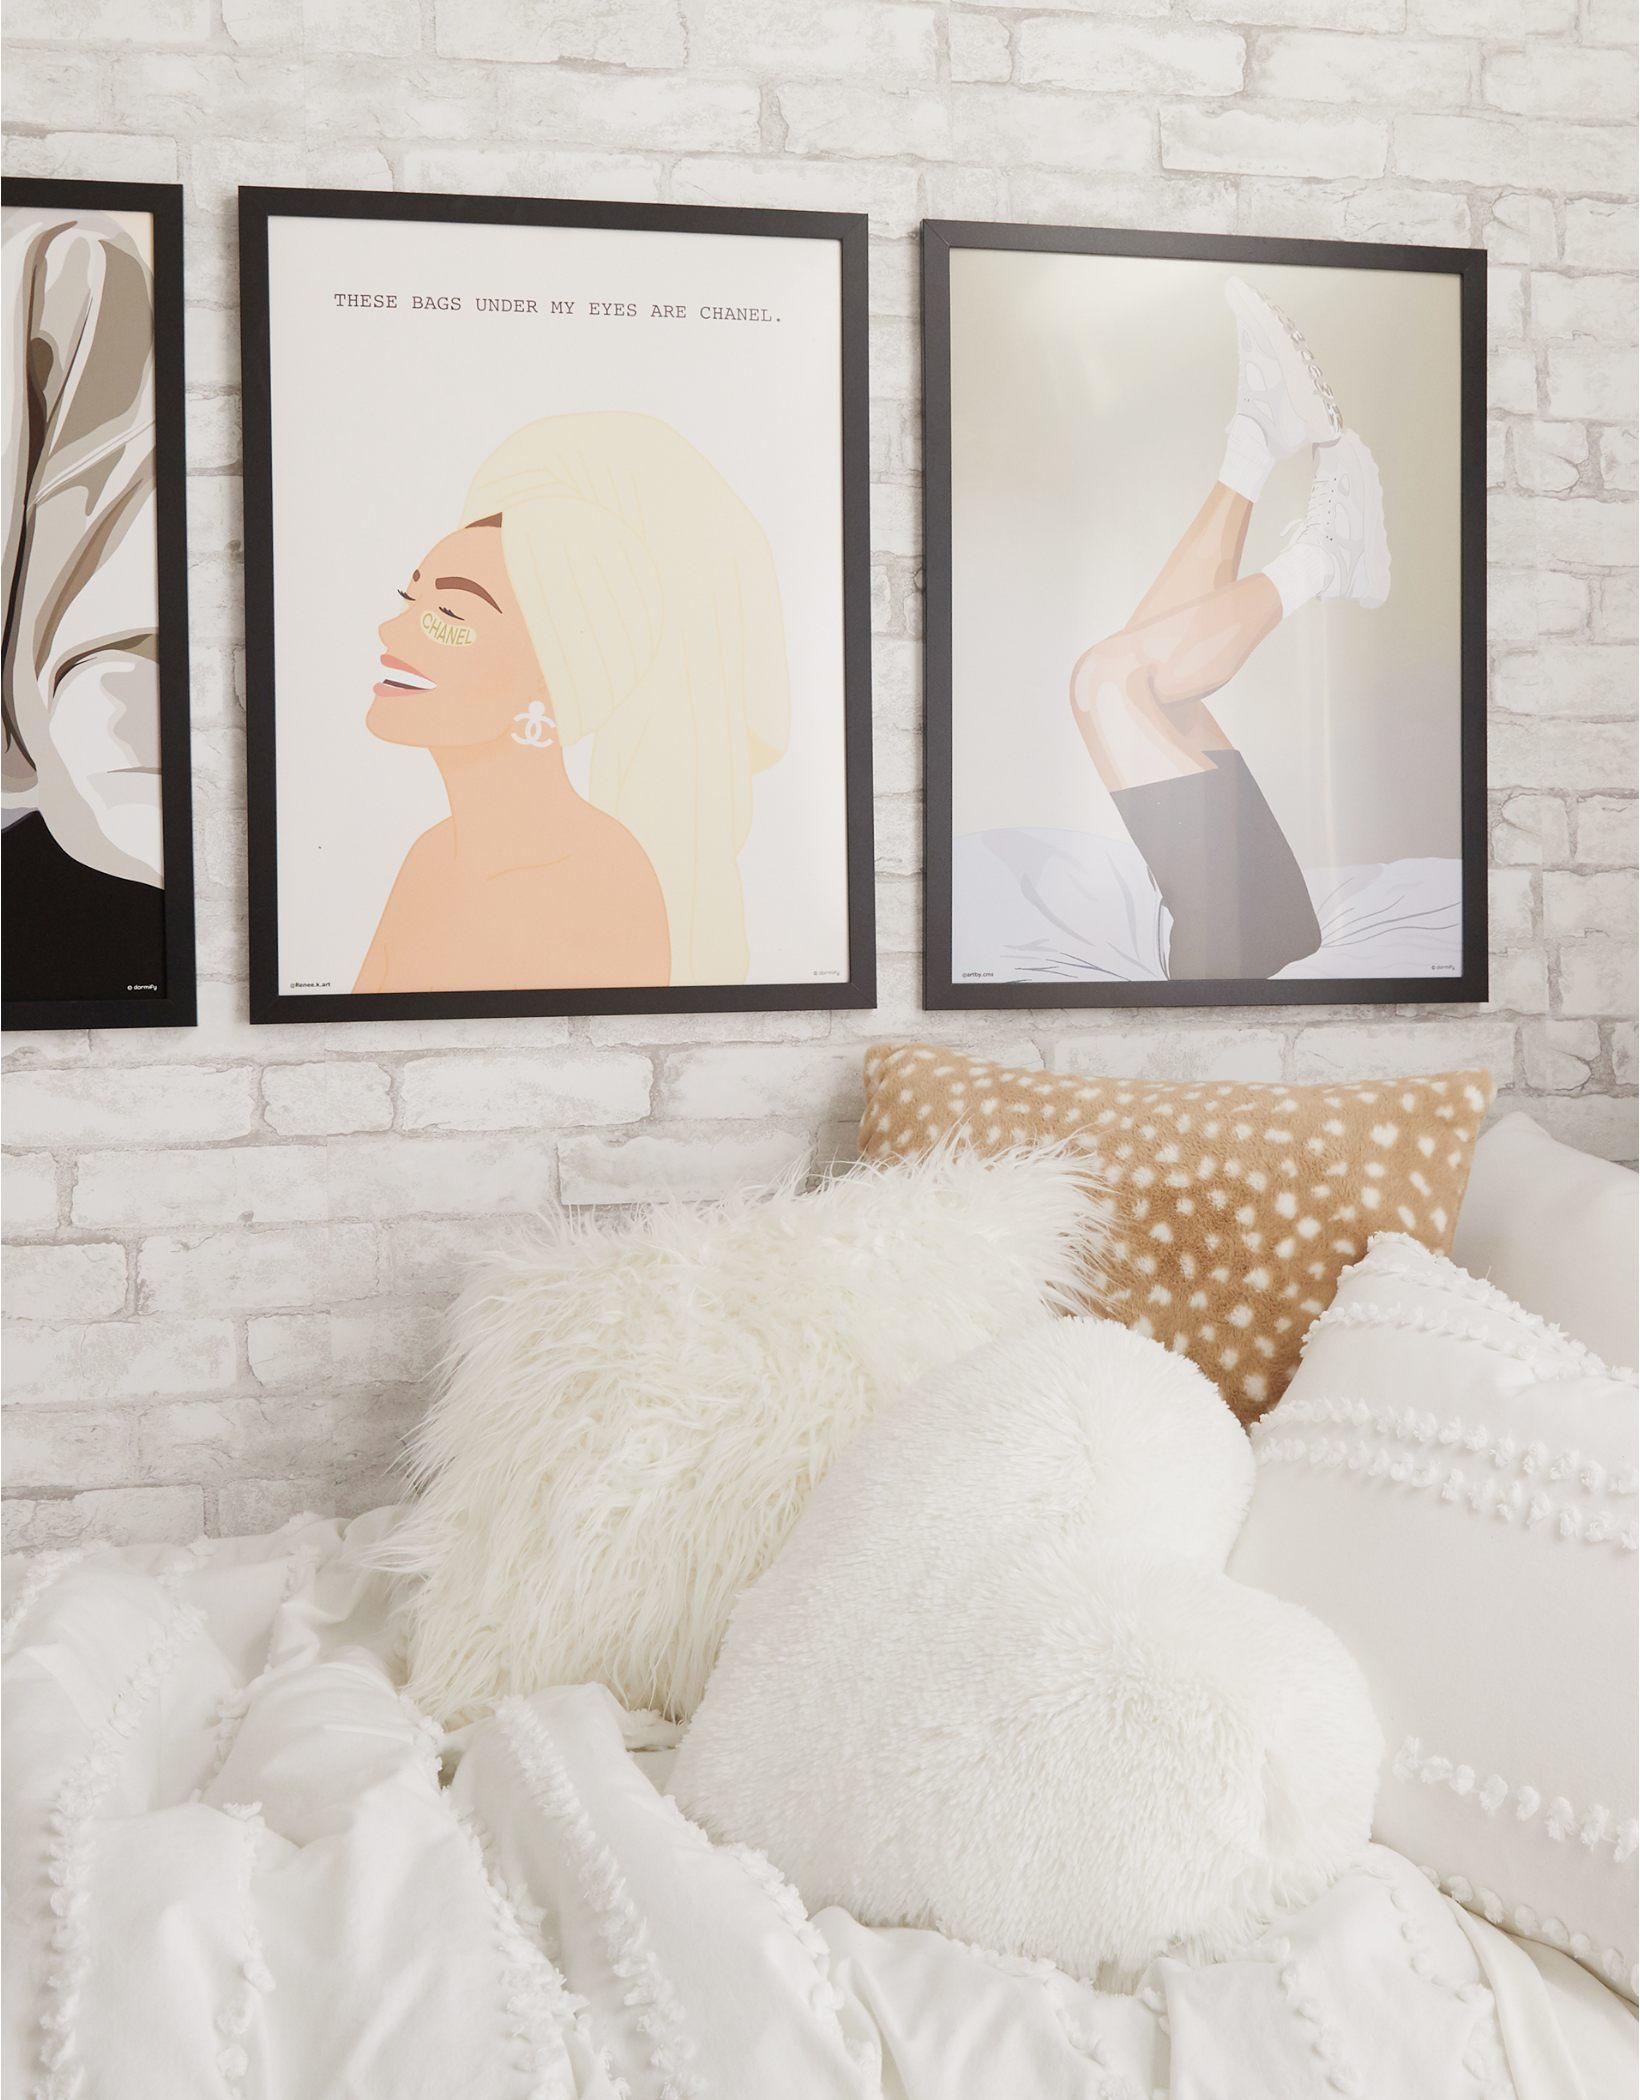 Dormify Lightweight Poster Frame